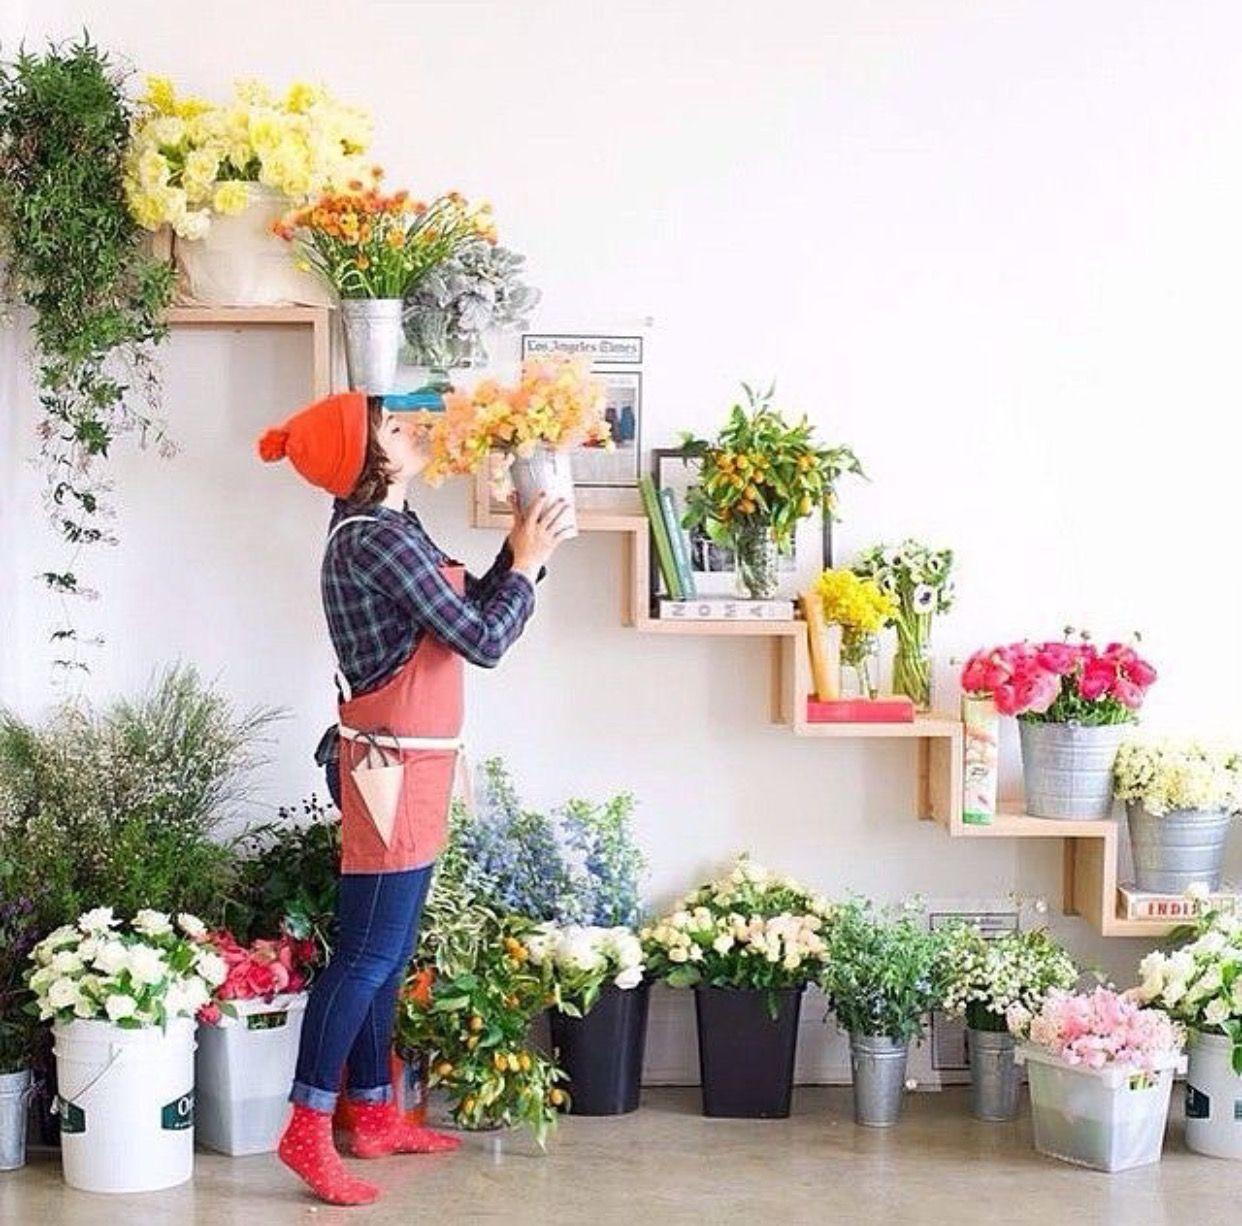 Pinterest|| @adarkurdish | room designs | Pinterest | Flower shops ...